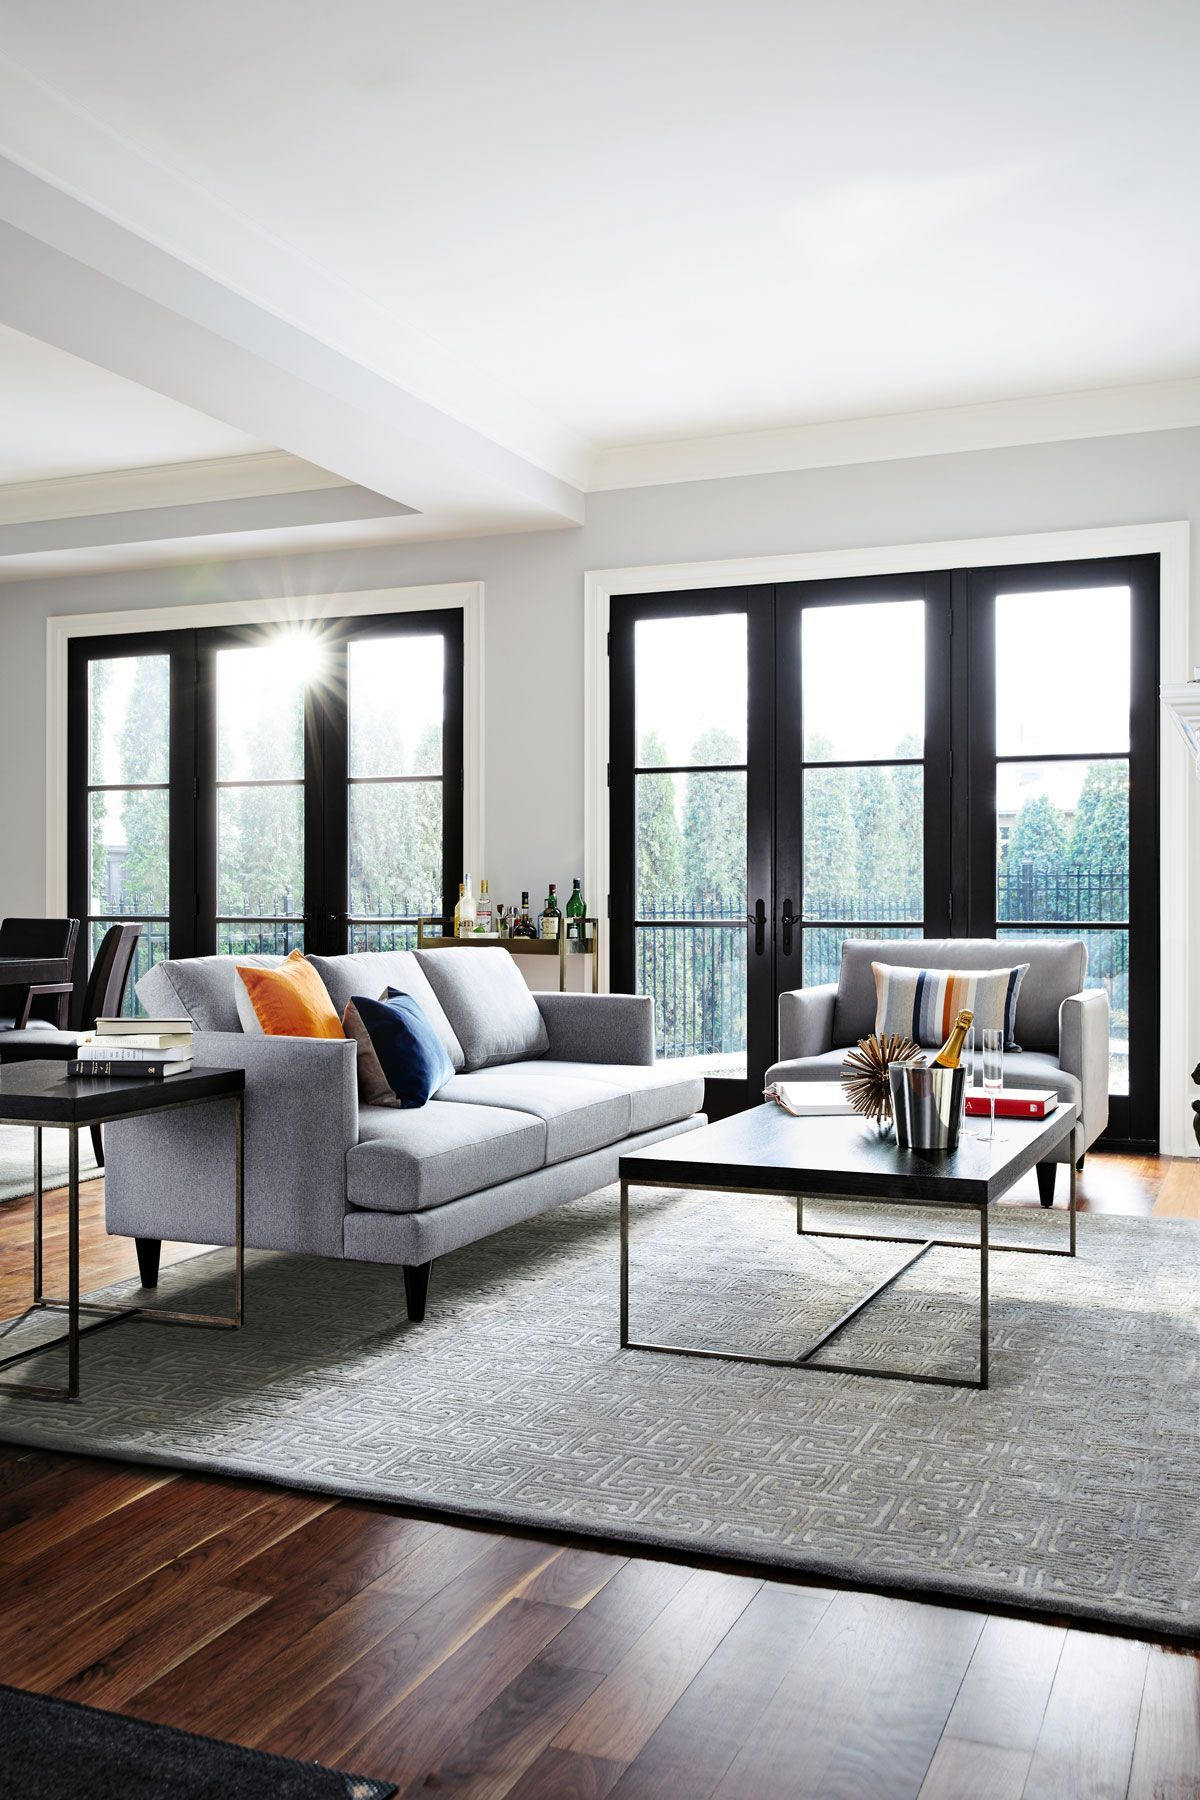 Budget Lounge Inspo June 2018 Living Room Ideas Uk Living Room Modern Living Room Ideas 2018